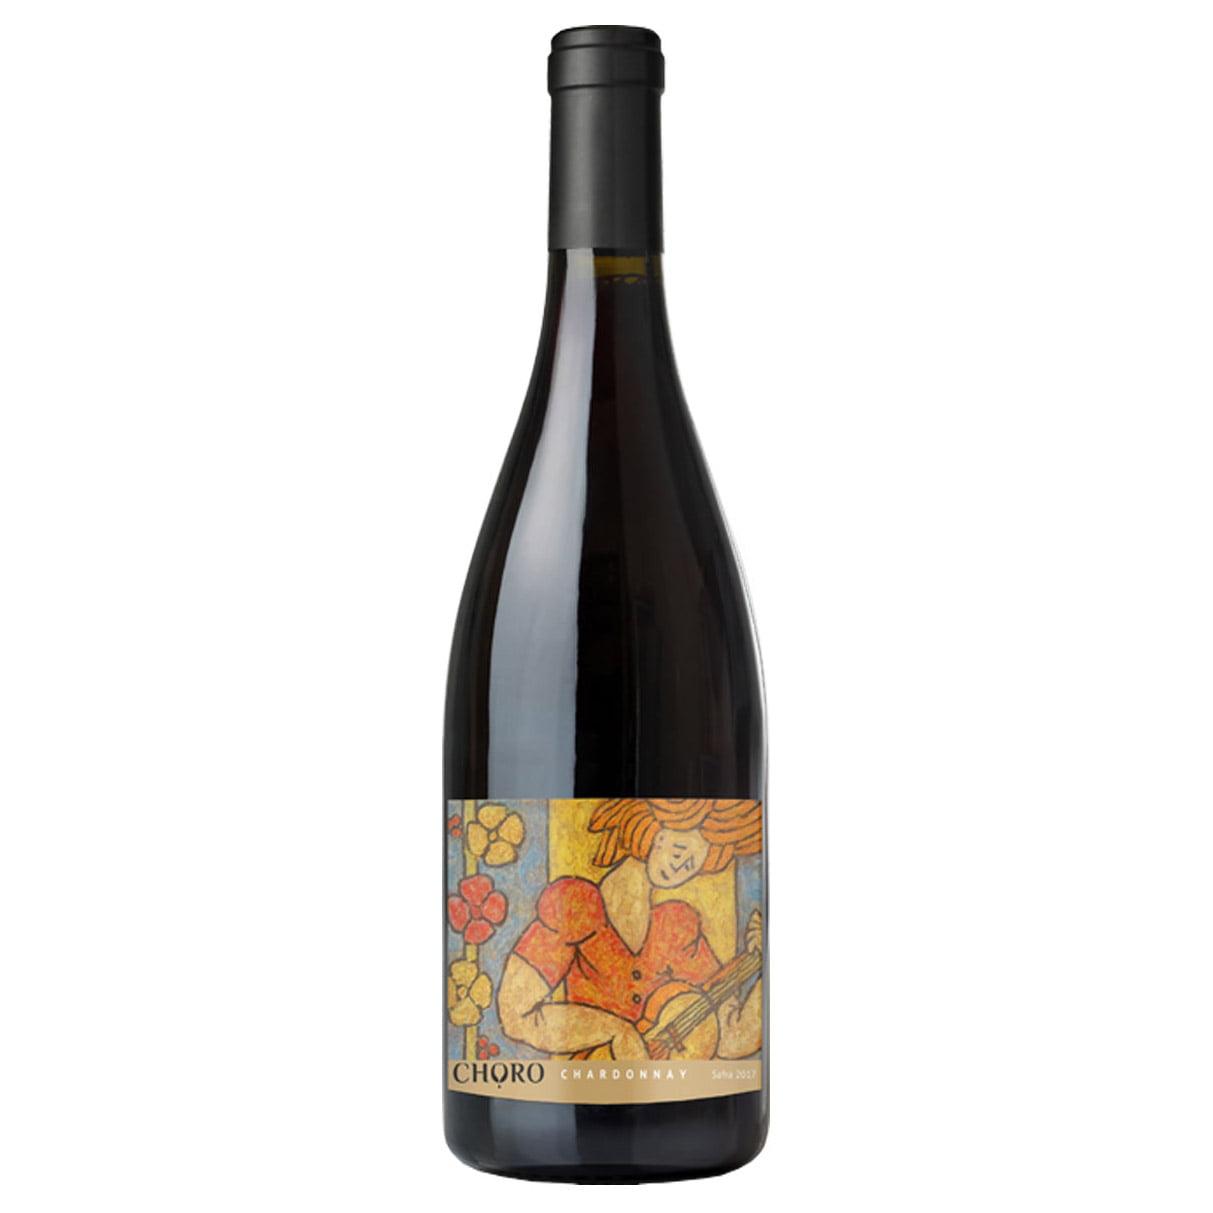 Enos Reserva do Choro Chardonnay 2017